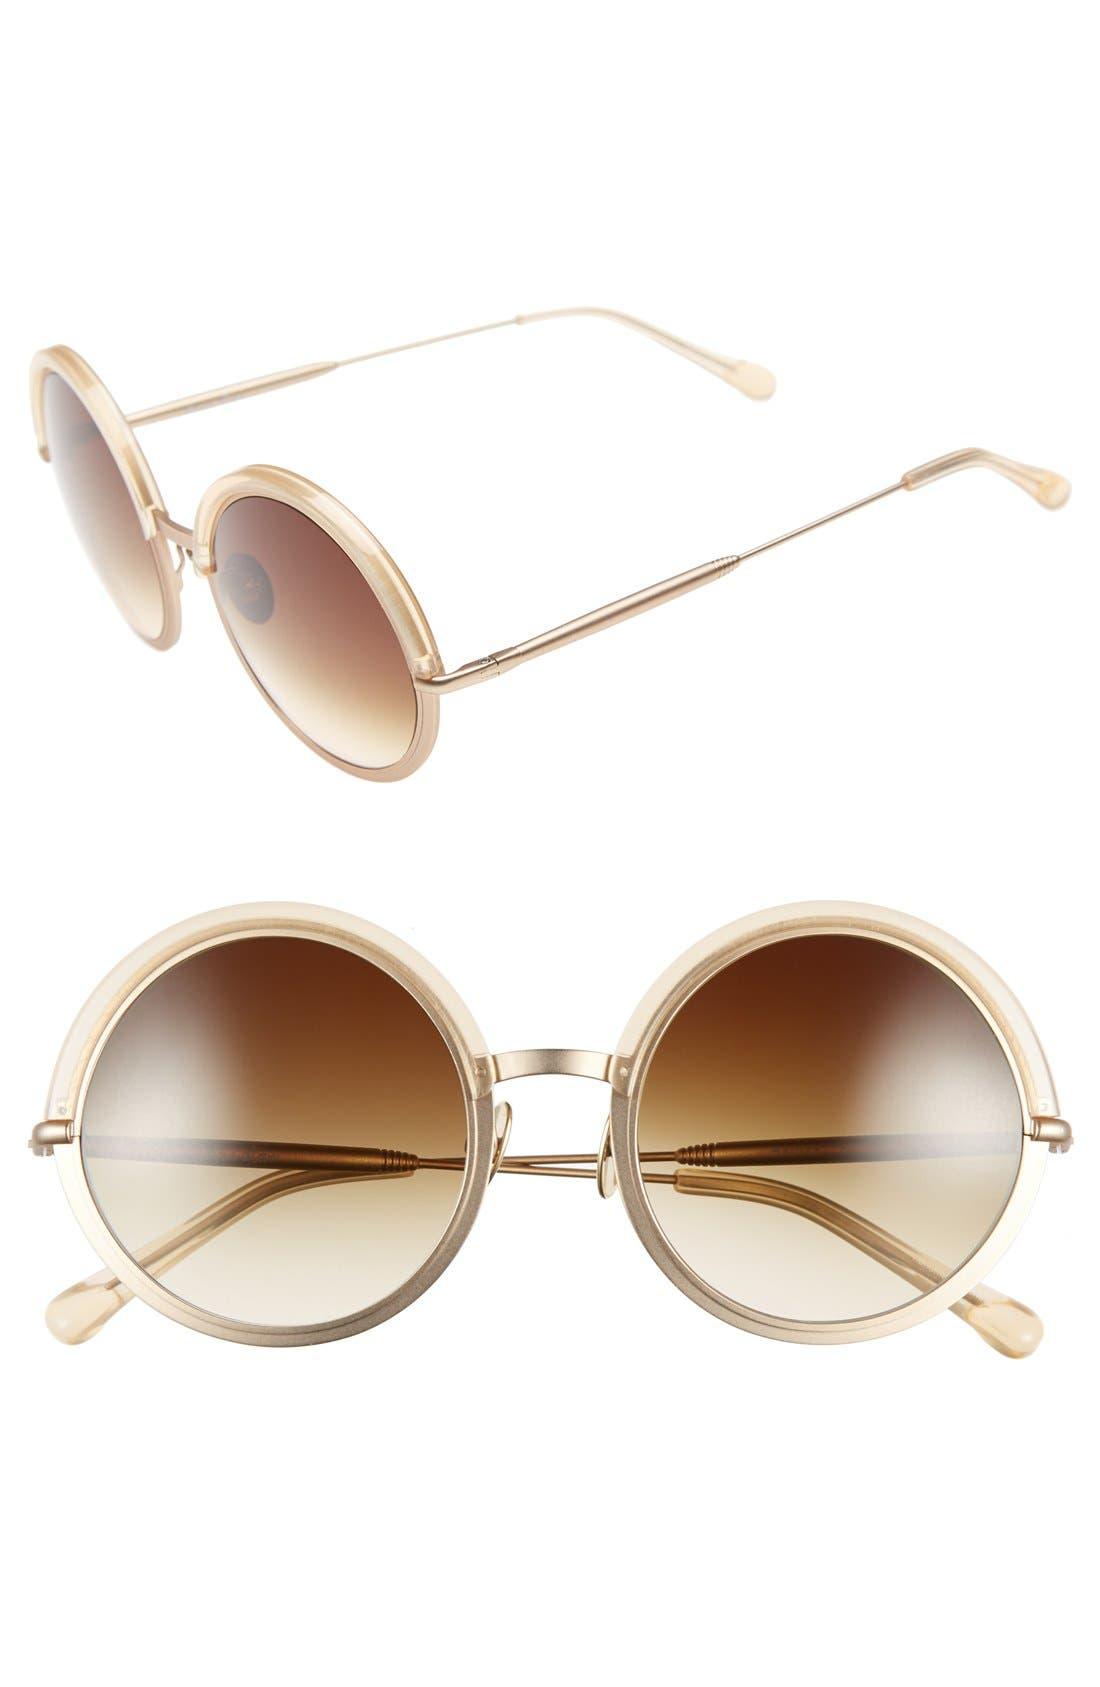 Main Image - Steven Alan 'Halsey' 50mm Retro Sunglasses